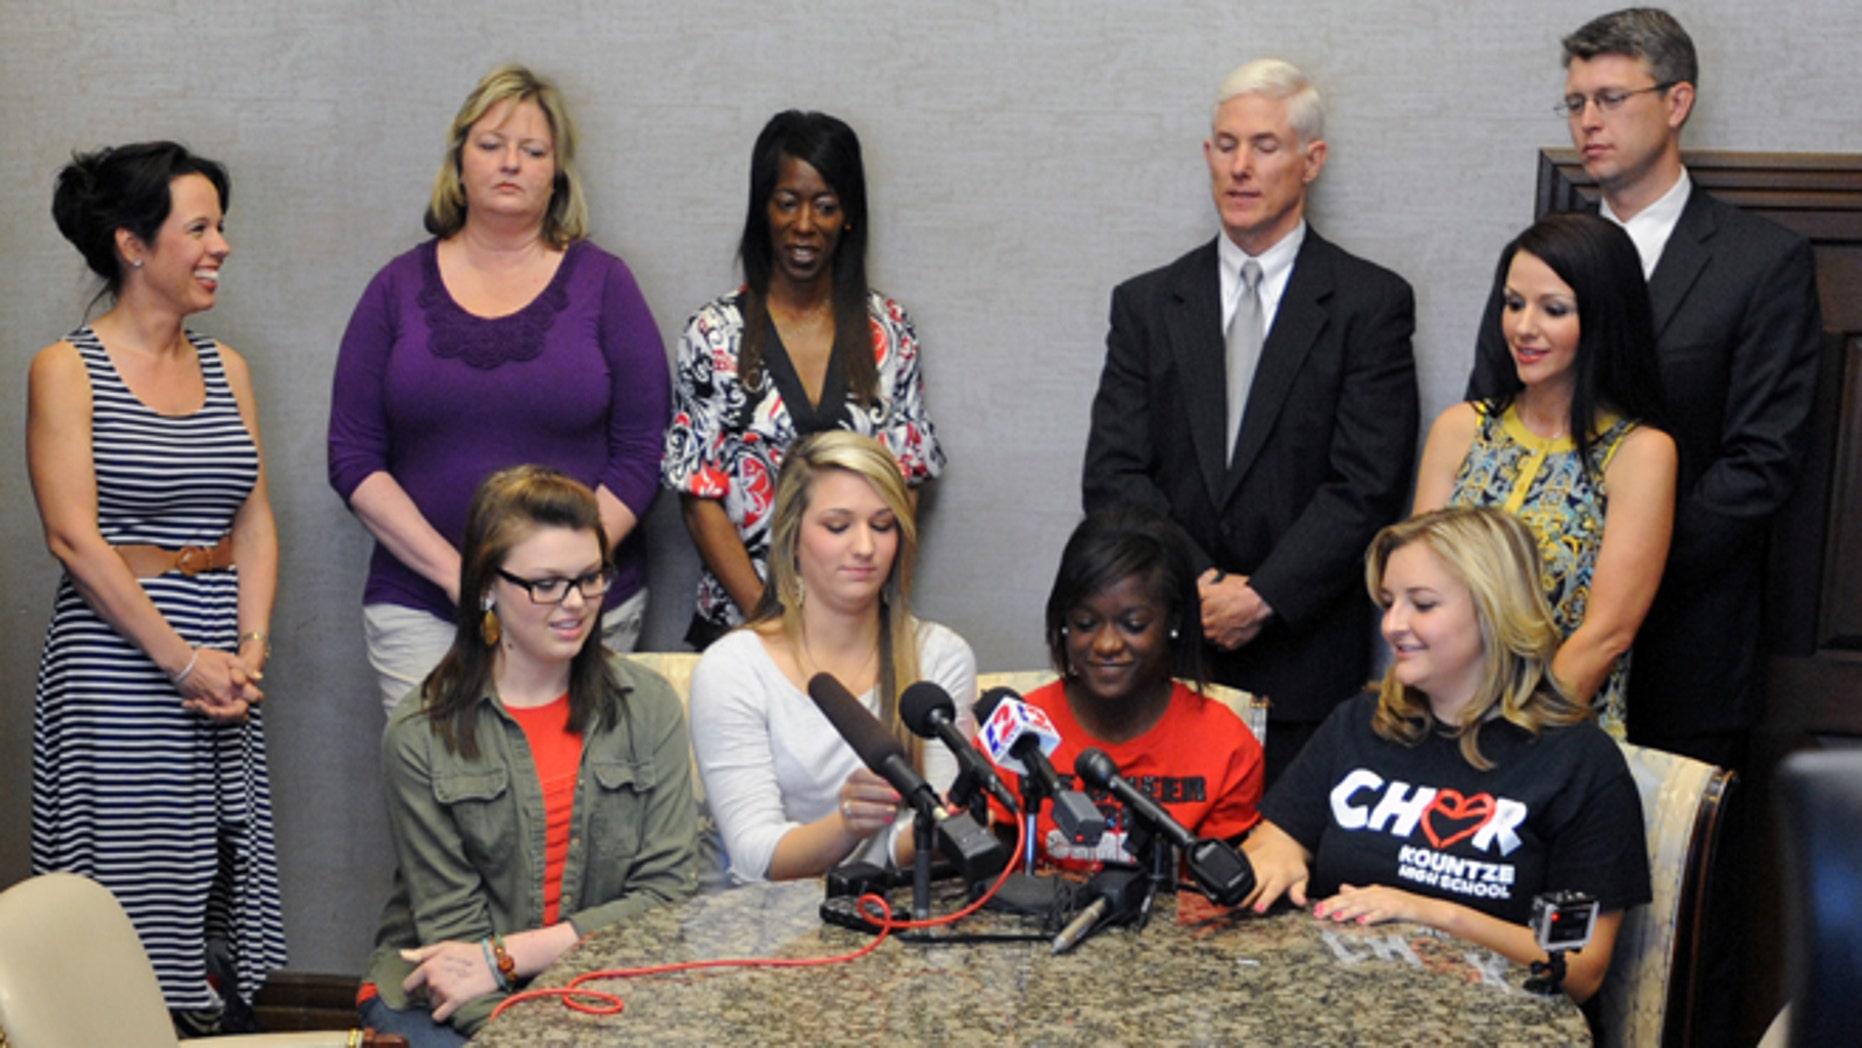 May 8, 2013: Kountze High School cheerleaders, from left, Savannah Short, Macy Matthews, Kieara Moffett and Rebekah Richardson speak to reporters in Beaumont, Texas.